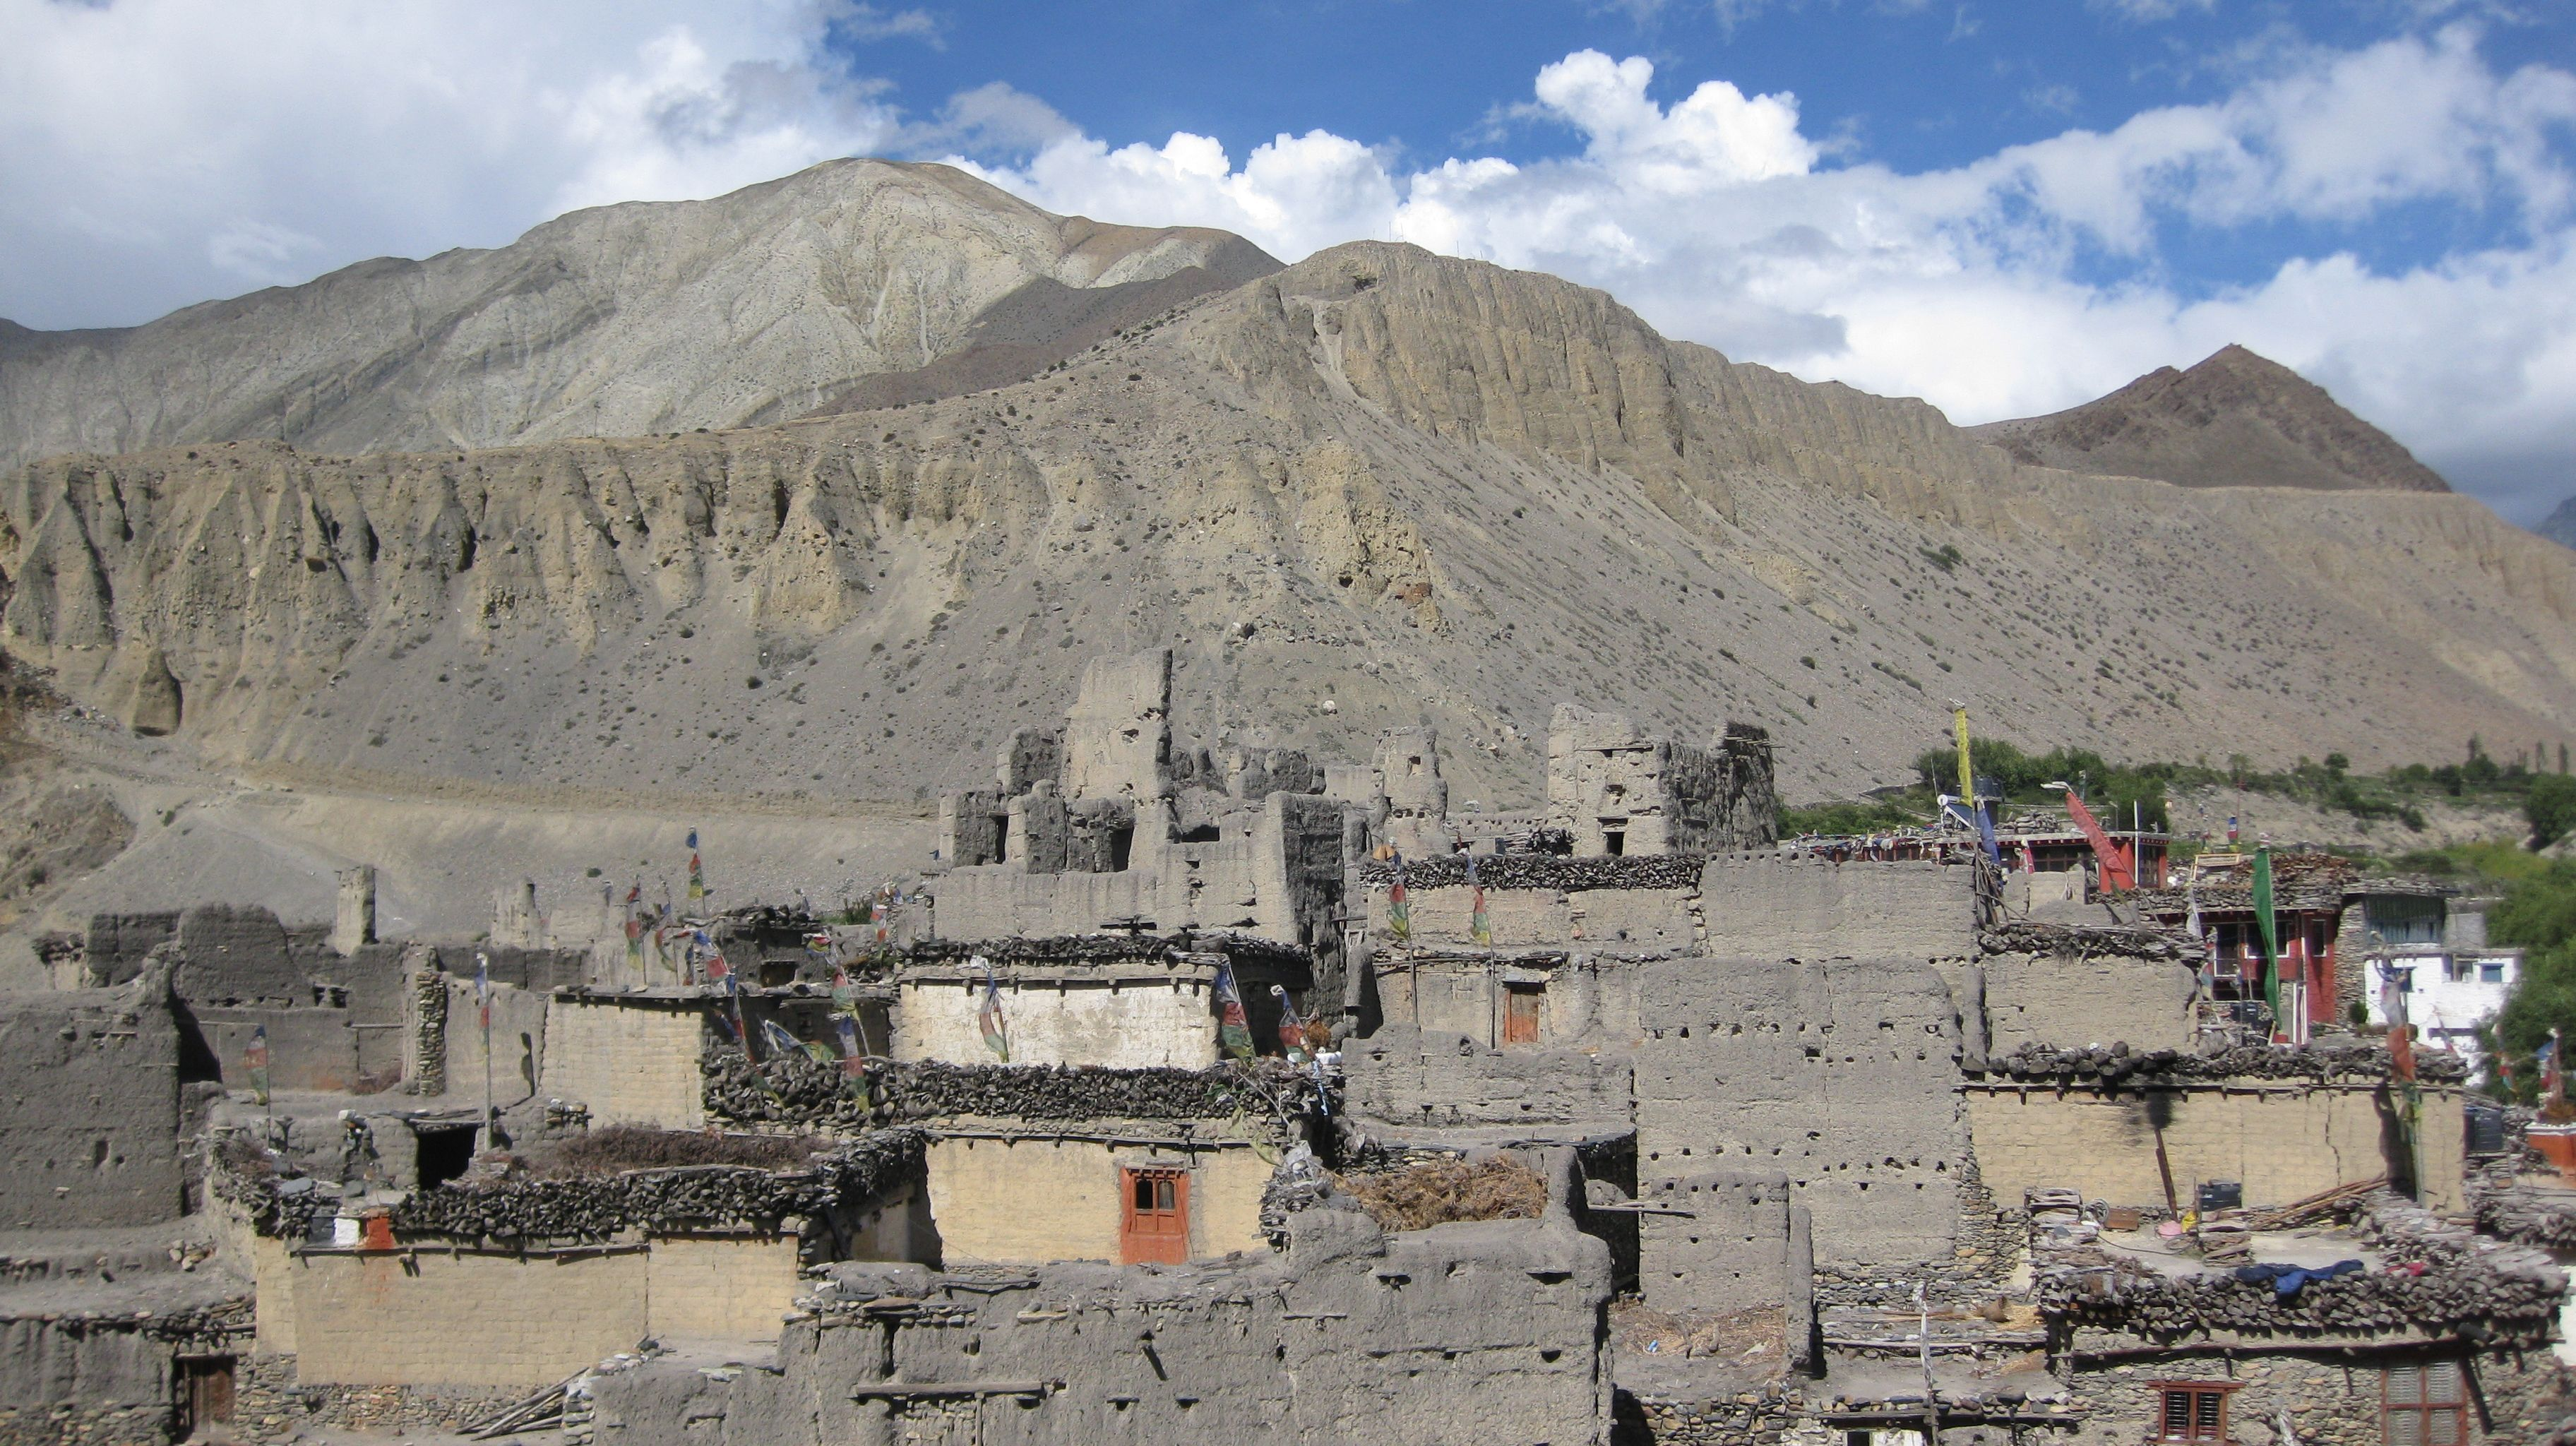 https://upload.wikimedia.org/wikipedia/commons/8/87/Houses_in_Kagbeni_village.jpg